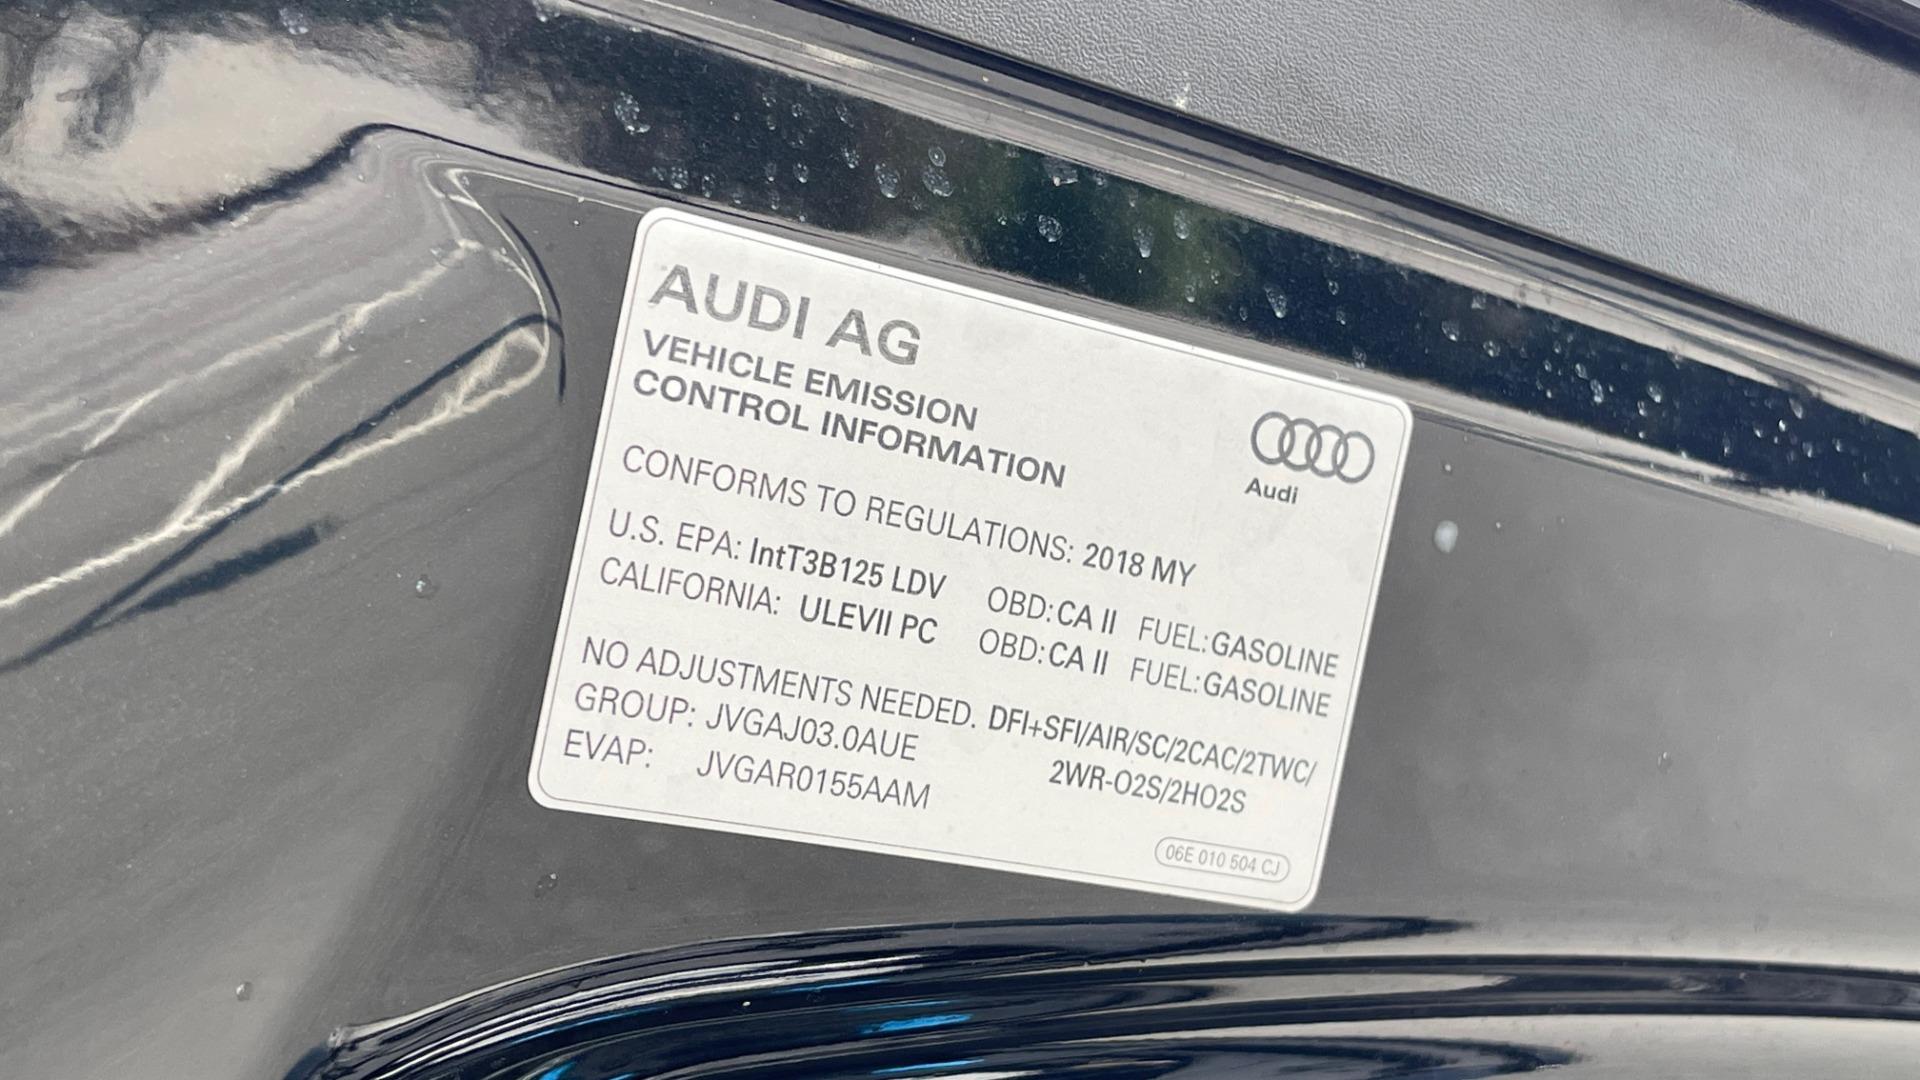 Used 2018 Audi Q7 PRESTIGE TIPTRONIC / NAV / SUNROOF / ADAPTIVE PKG / DRVR ASST / CLD WTHR /  for sale $49,995 at Formula Imports in Charlotte NC 28227 8